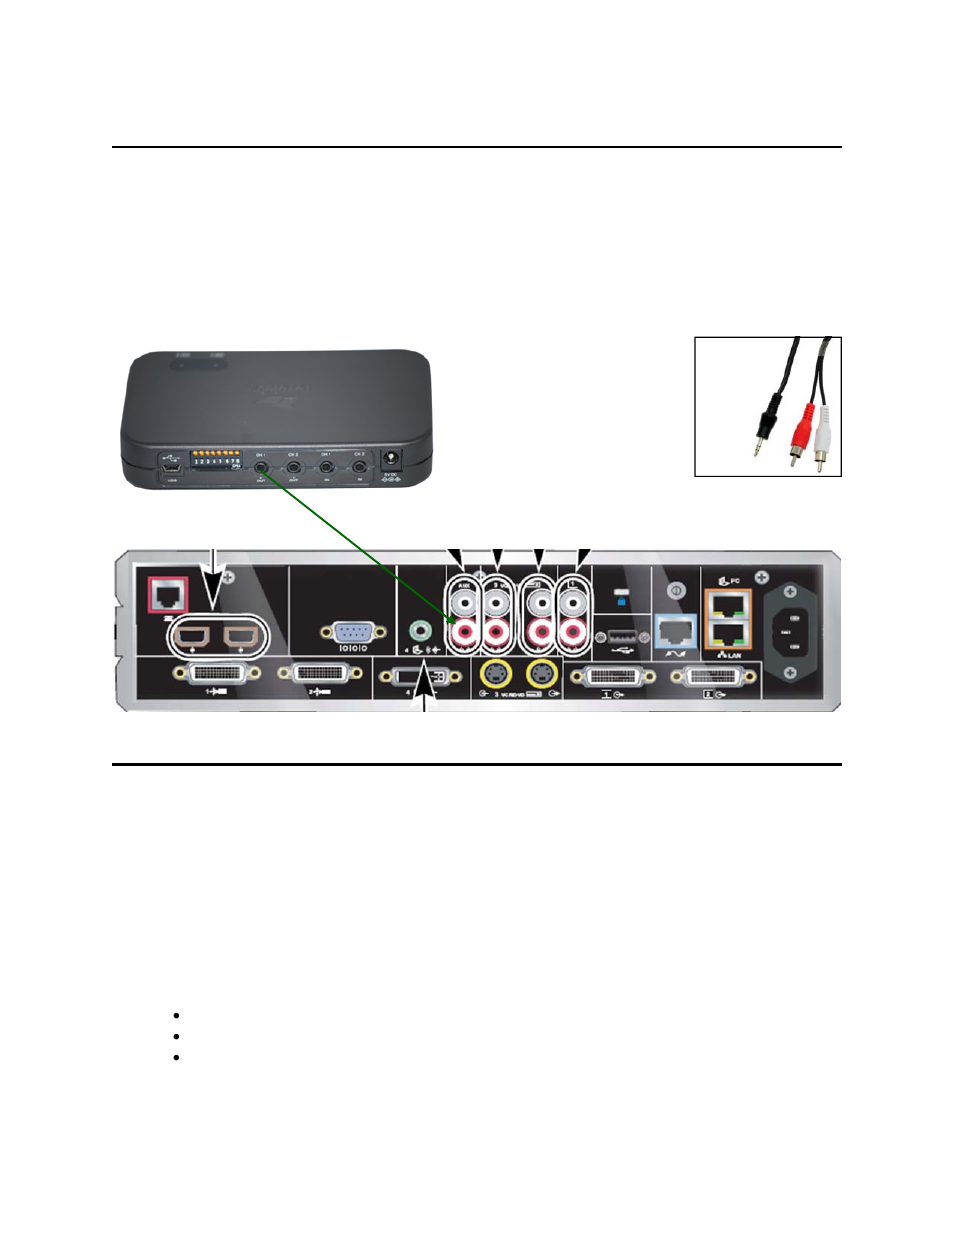 Revolabs Hd Single  U0026 Dual Channel System  U2014 Polycom Hdx